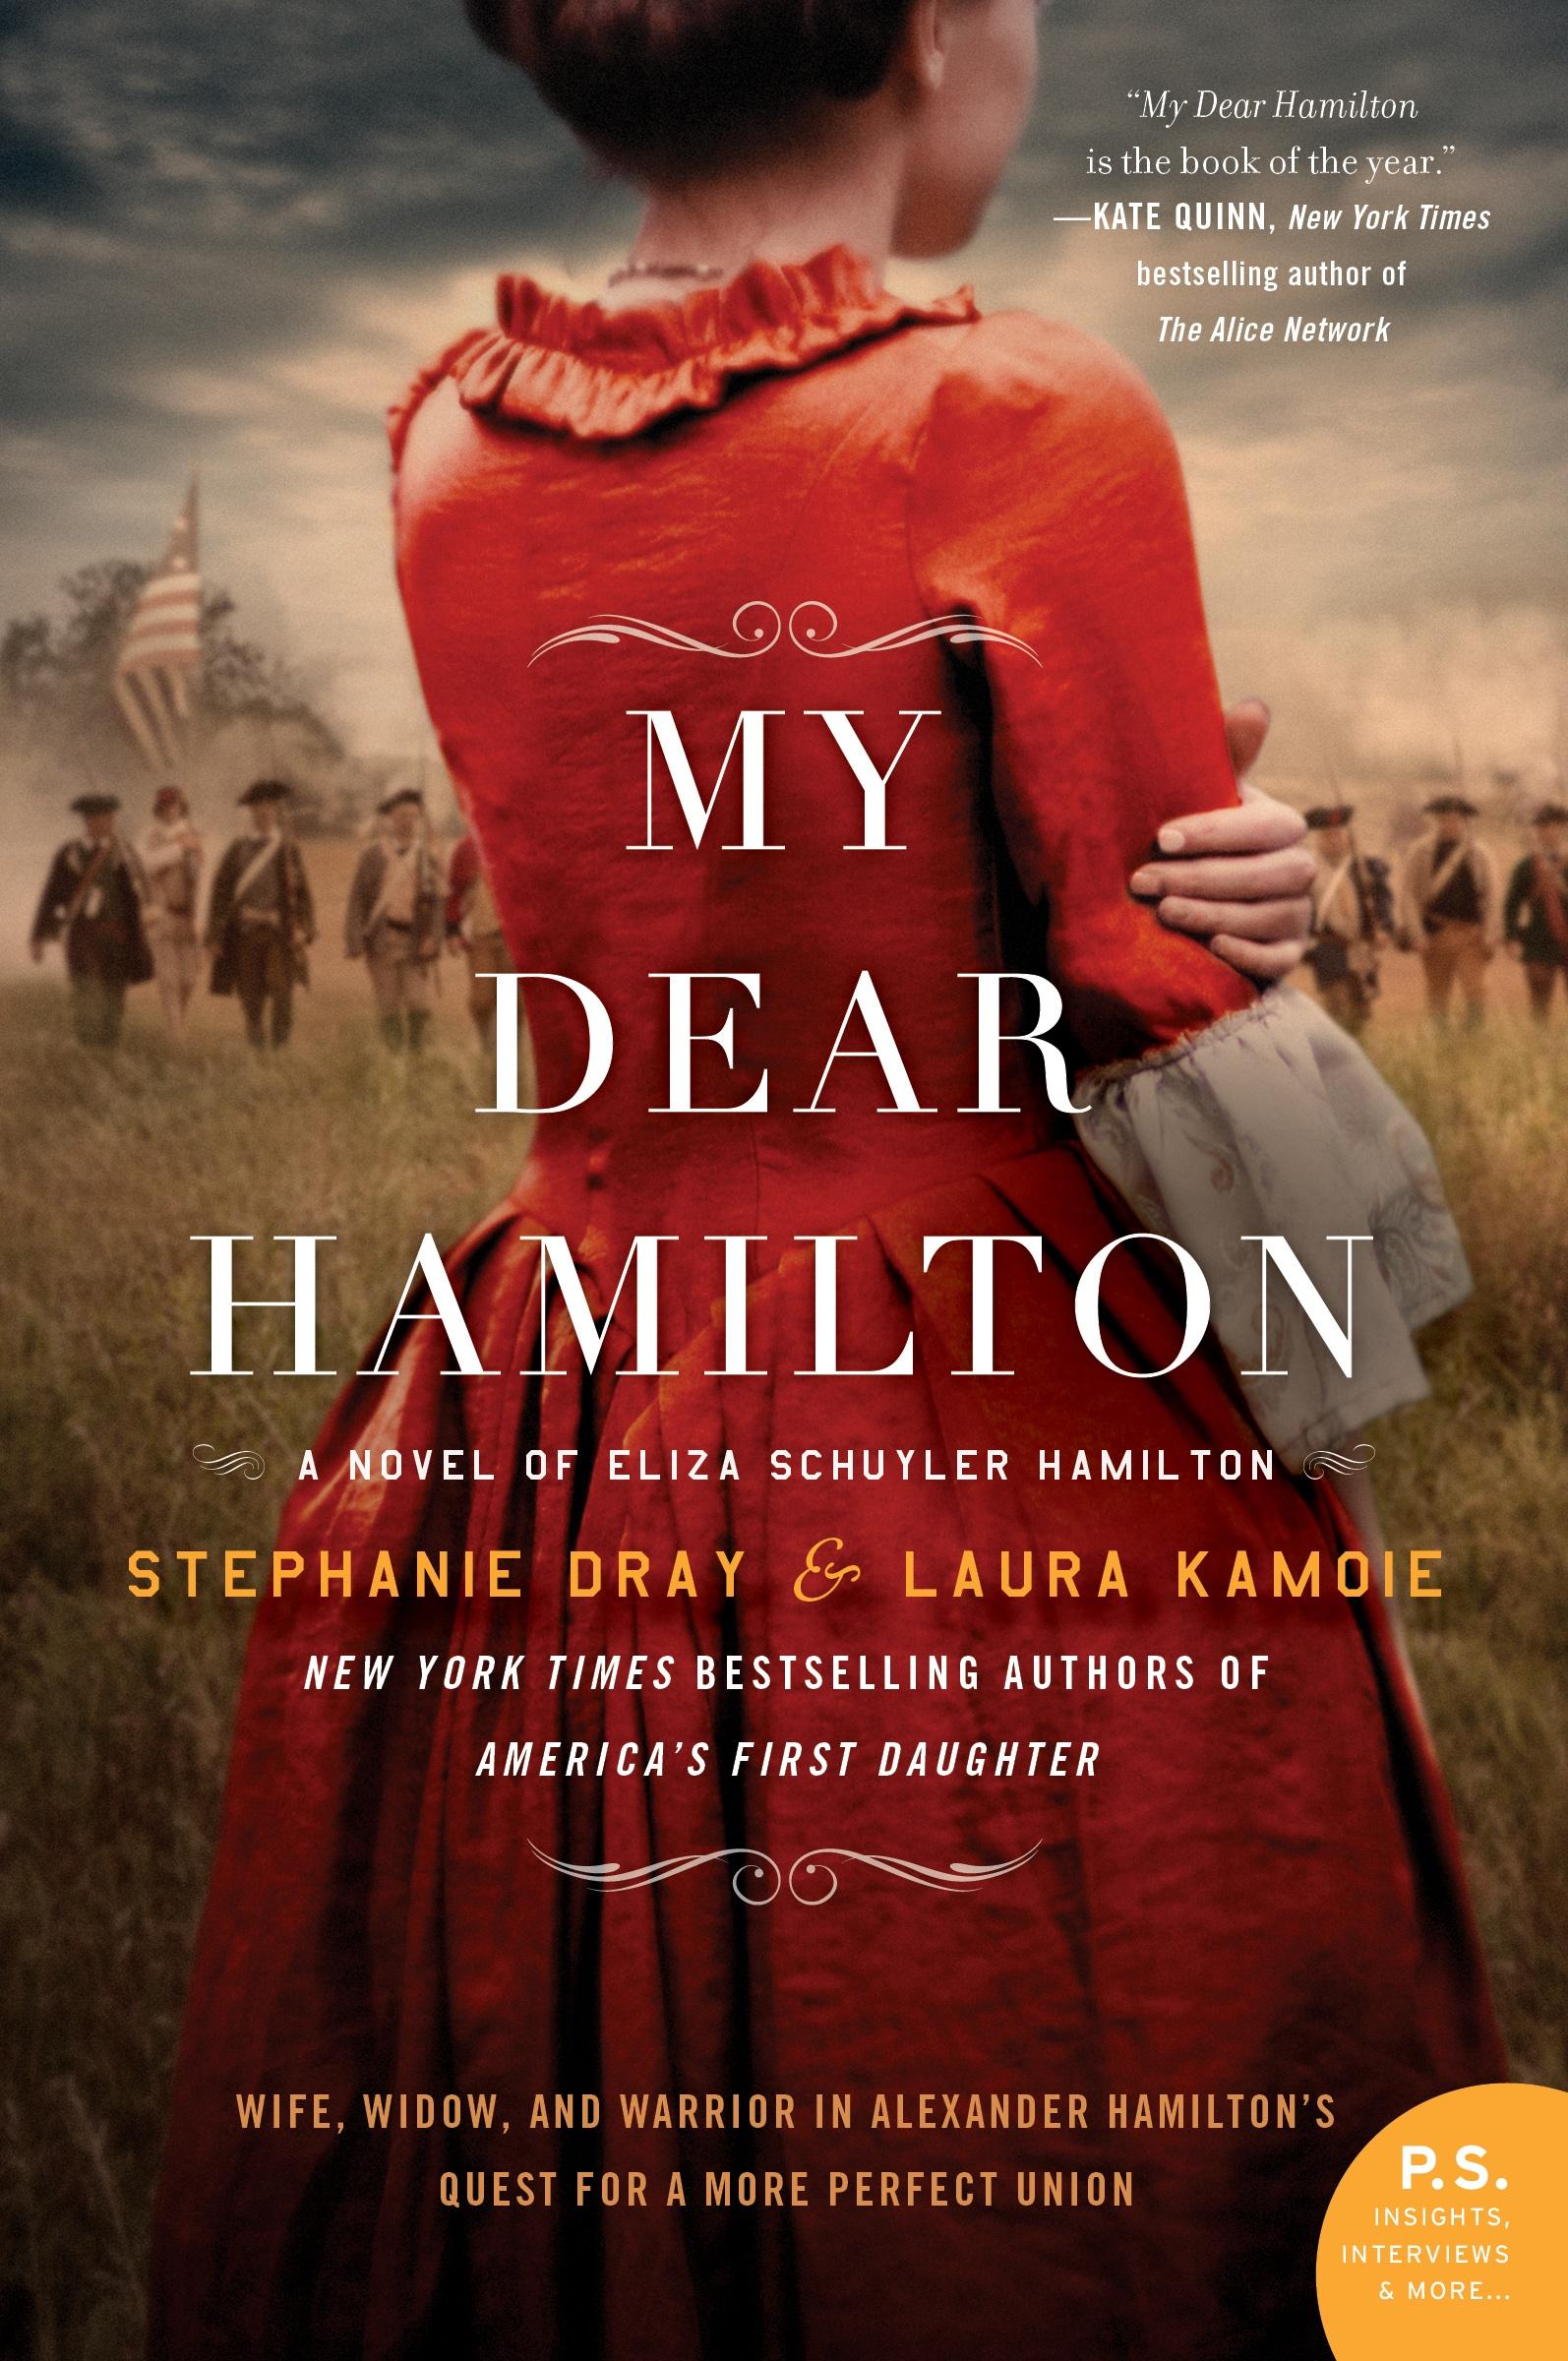 My Dear Hamilton- A Novel of Eliza Schuyler Hamilton byStephanie Dray and Laura Kamoie.jpg